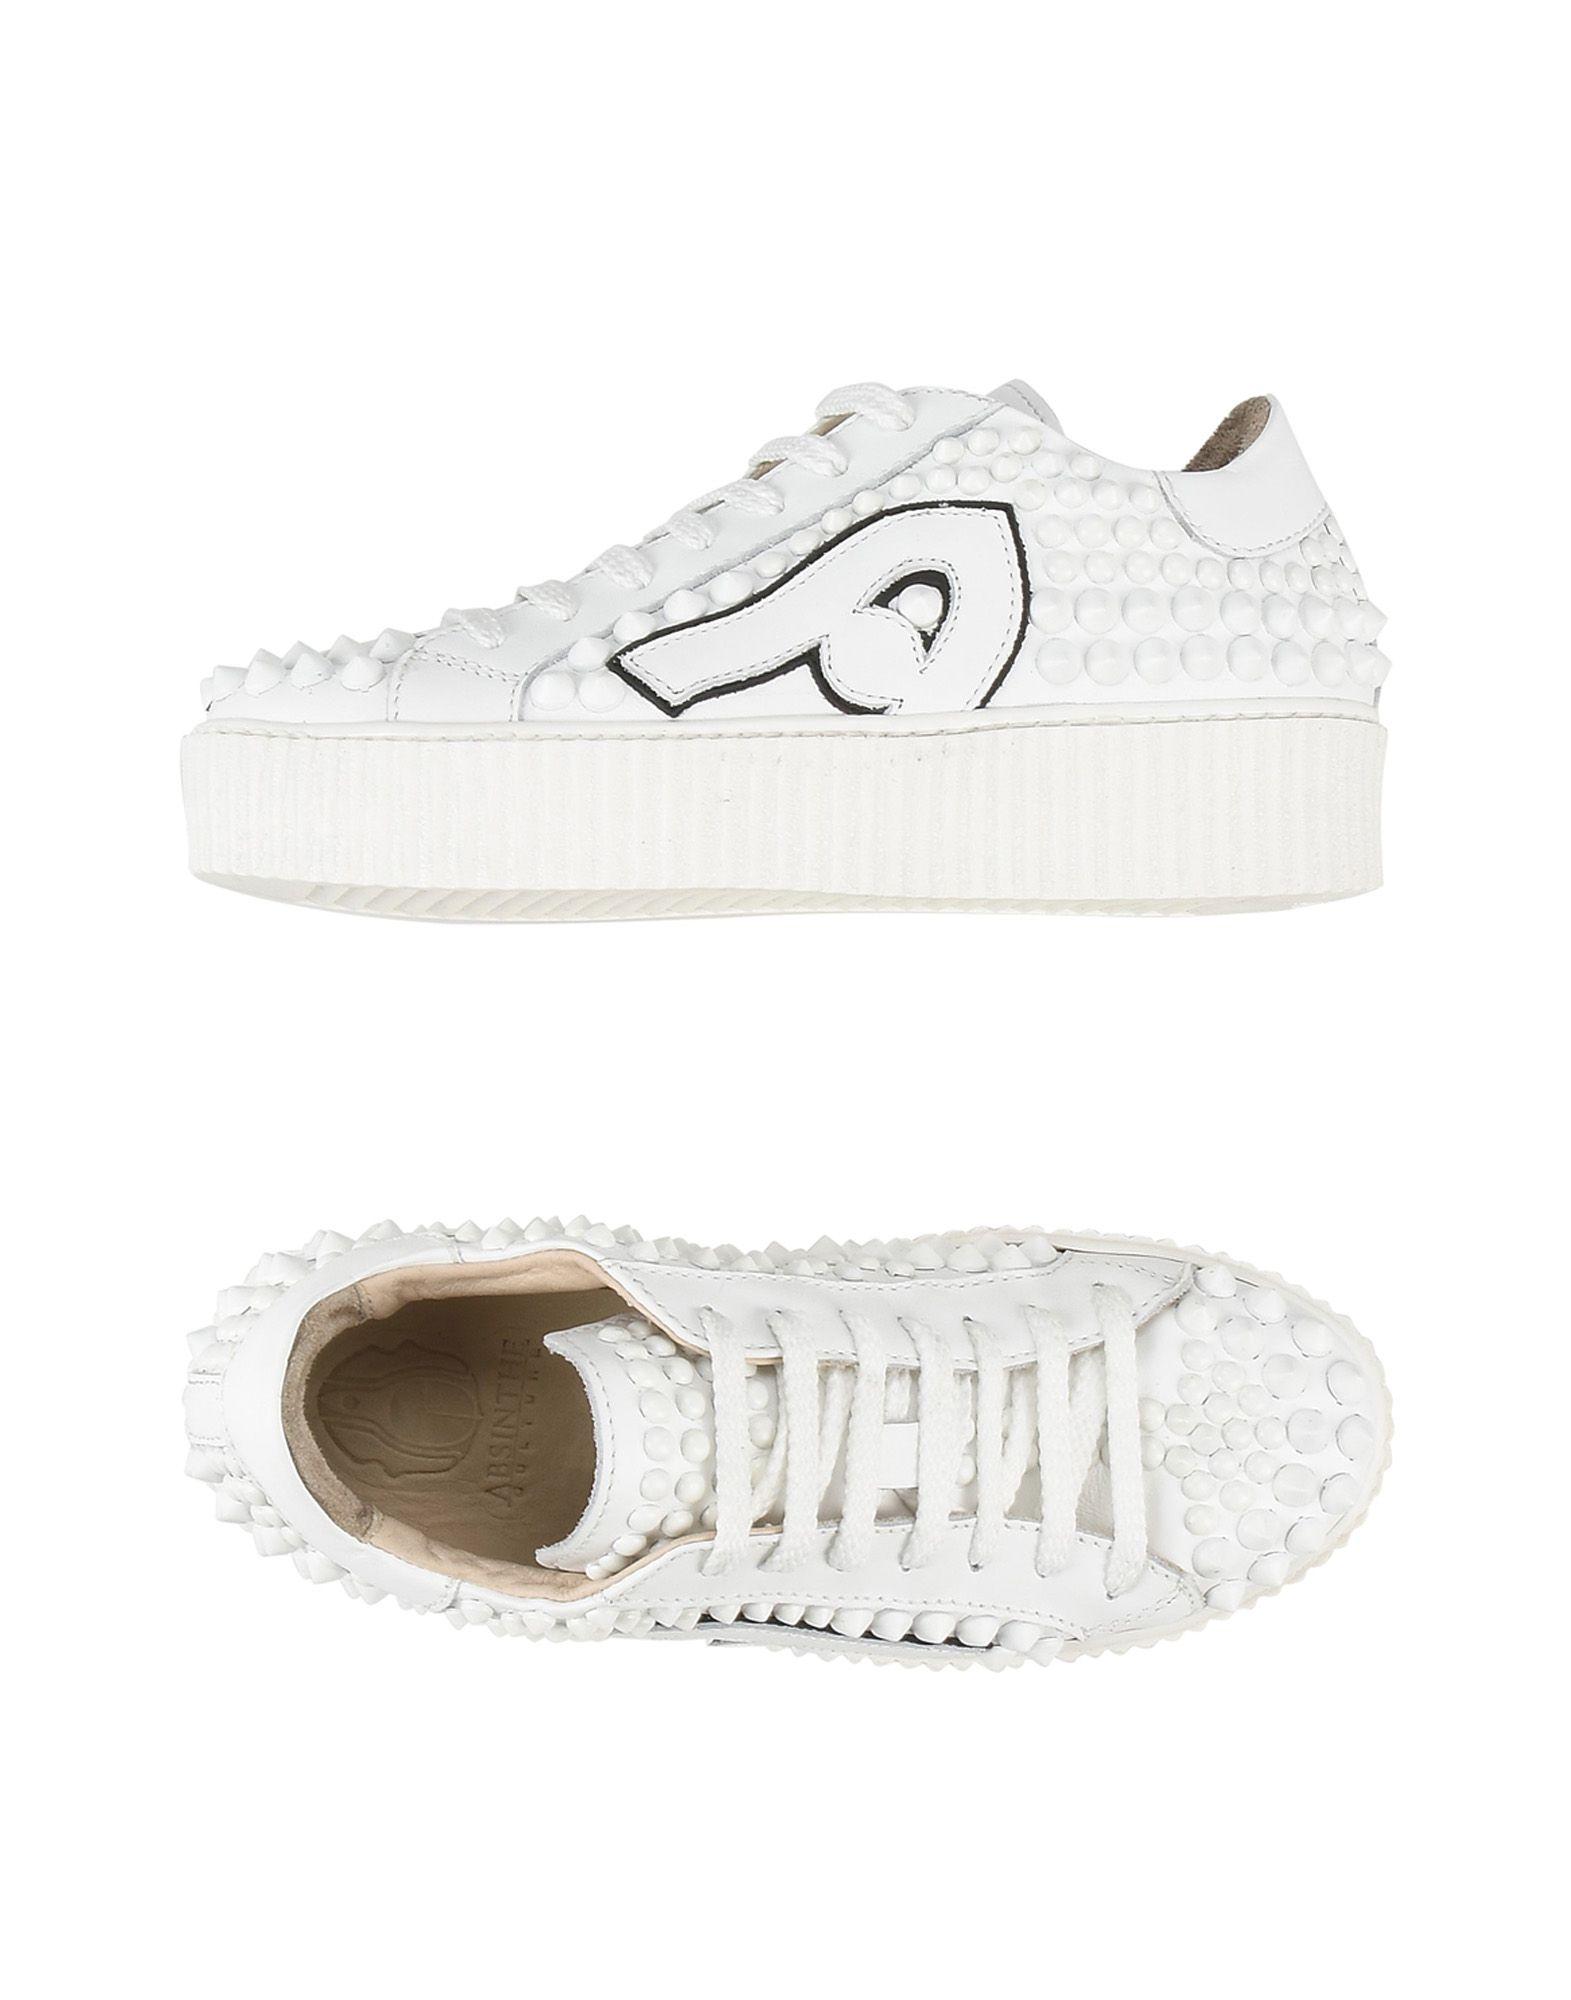 Sneakers Absinthe Culture Bl28 White+White White+White White+White - Donna - 11195426CP 4a43df